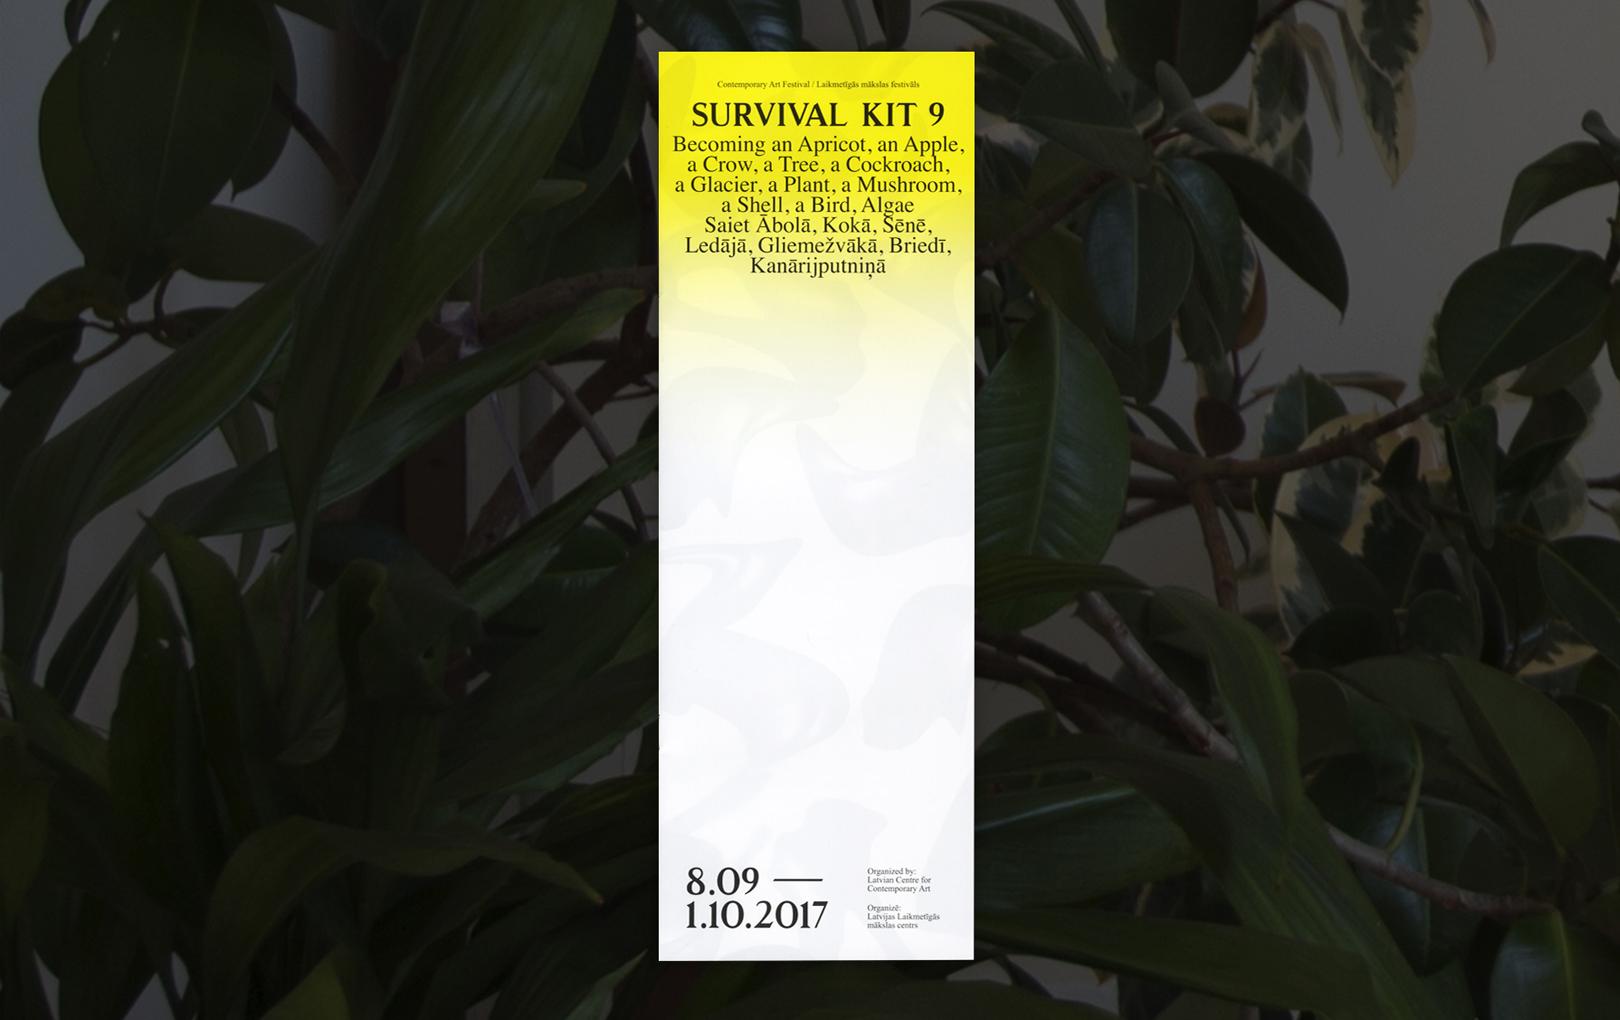 Survival Kit 9